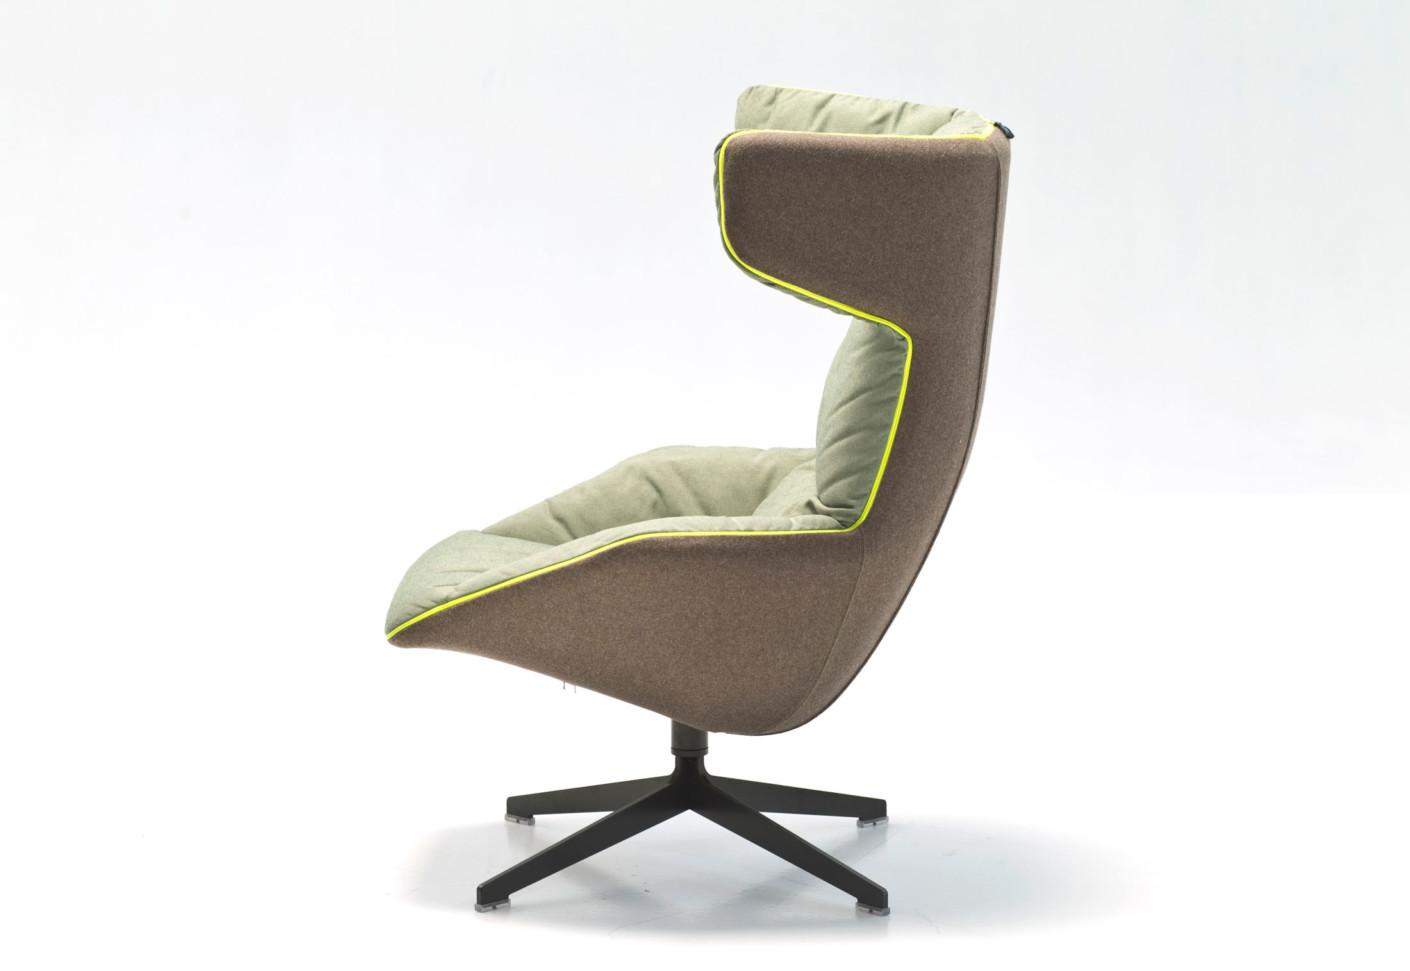 Take A Soft Line For A Walk Swivel Armchair By Moroso STYLEPARK